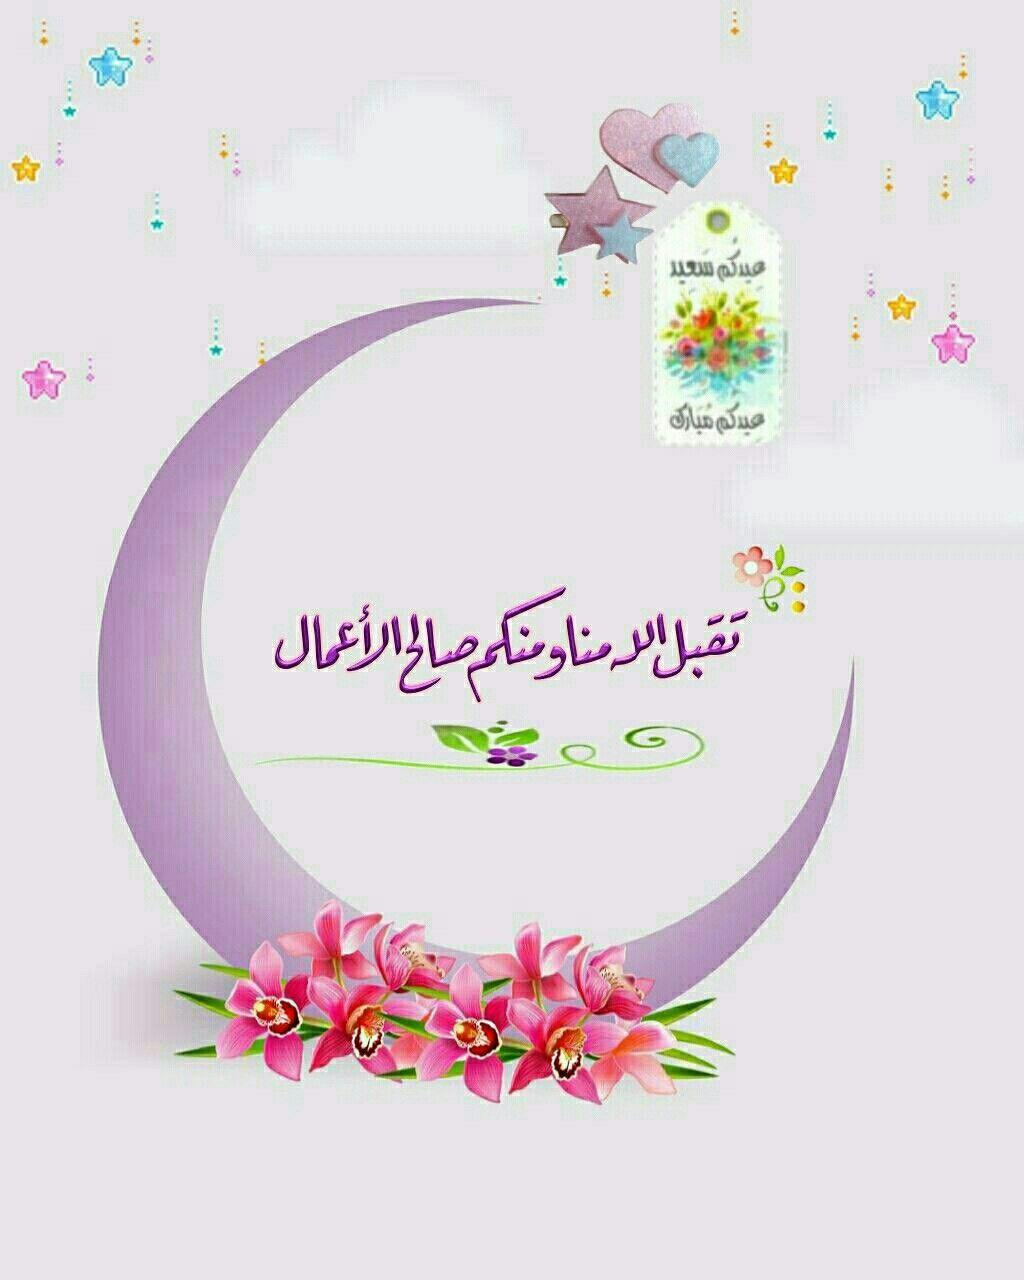 Taqabbal Allaahu Minna Wa Minkum Eid Eid Mubarak Greetings Eid Stickers Eid Greetings